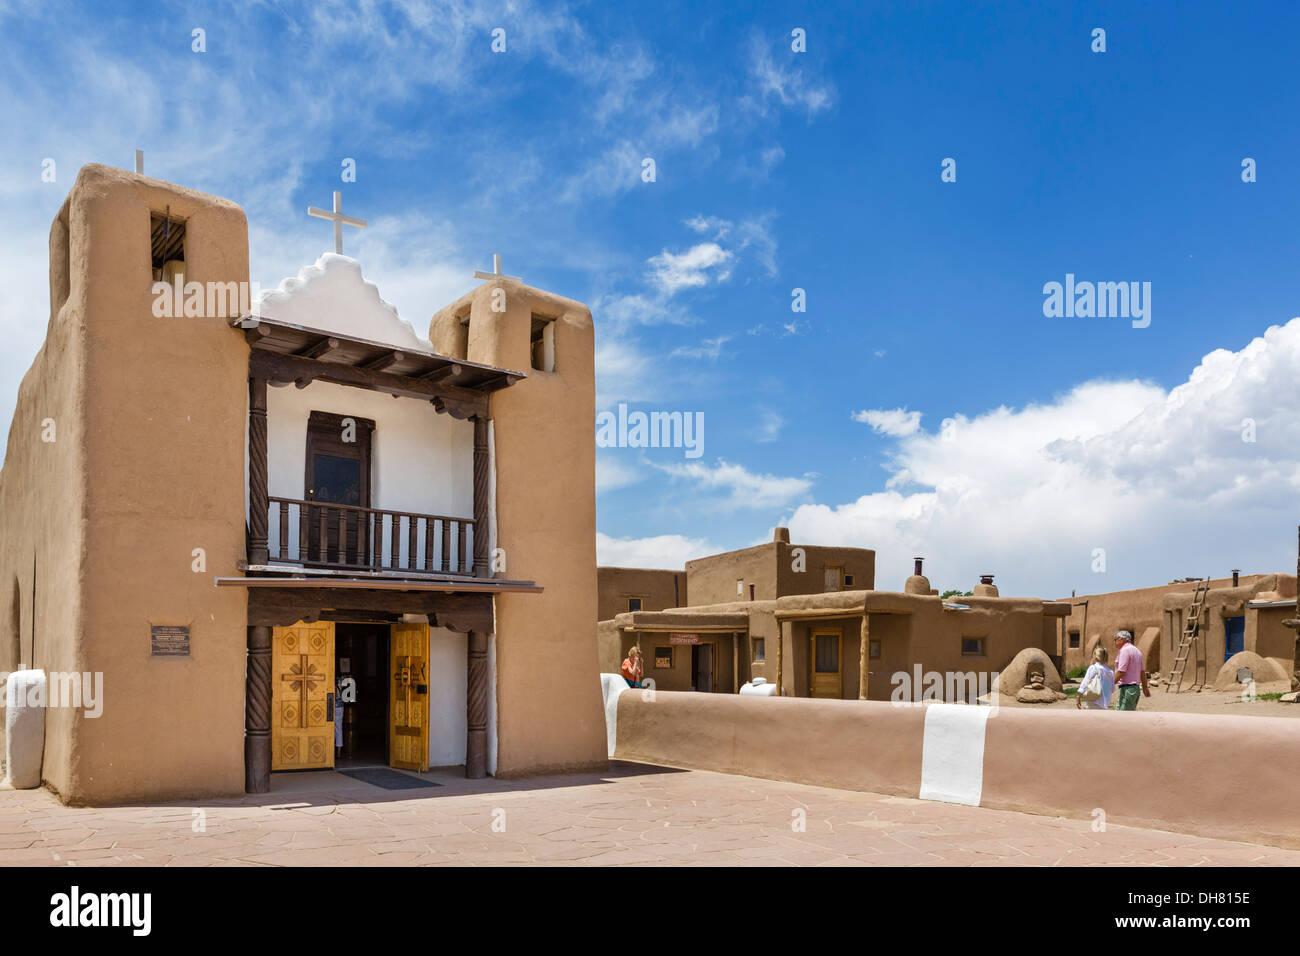 The church in historic Taos Pueblo, Taos, New Mexico, USA - Stock Image